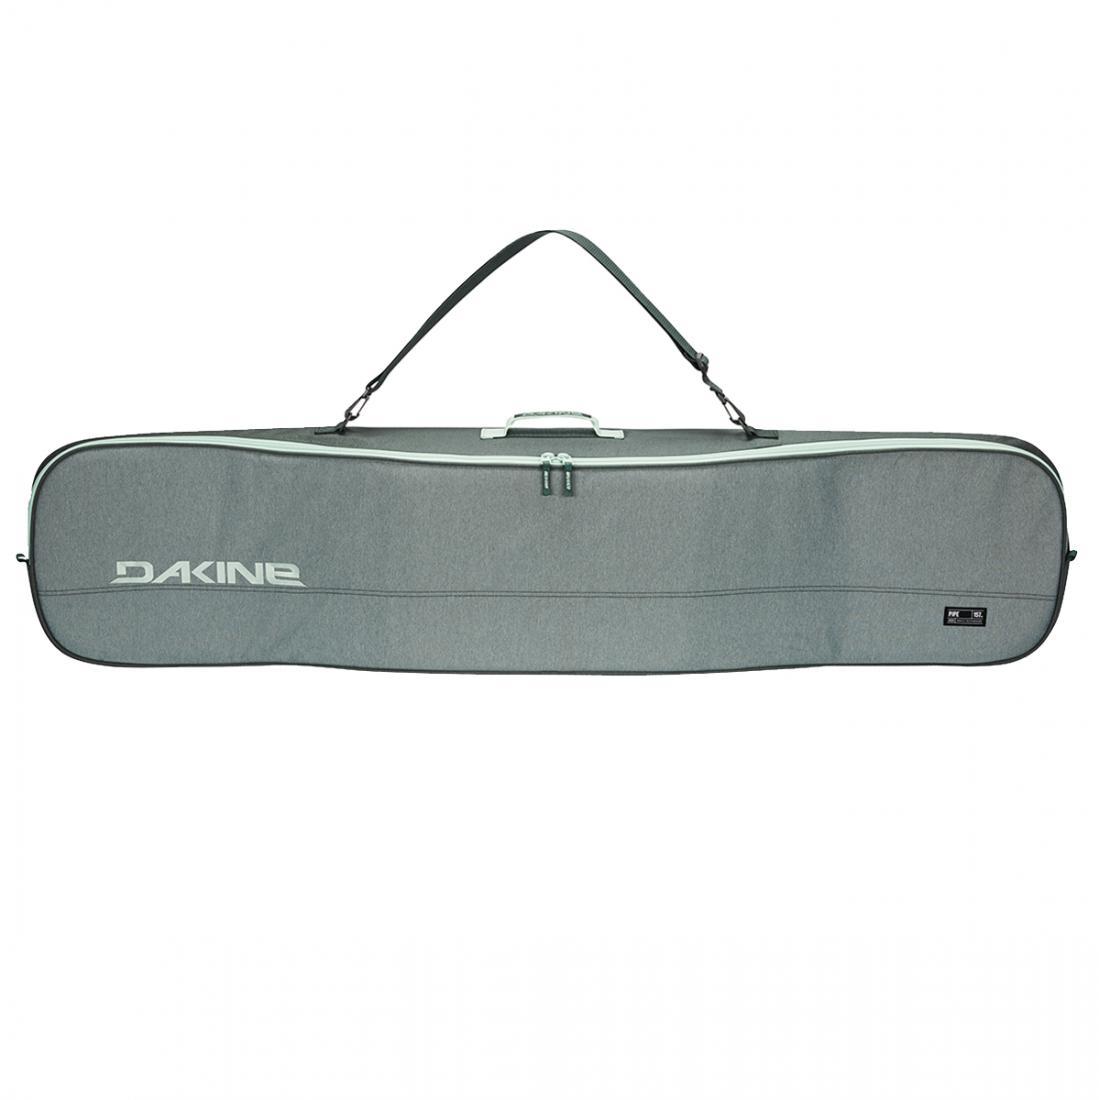 Чехол для сноуборда Dakine Pipe Snowboard Bag купить в Boardshop №1